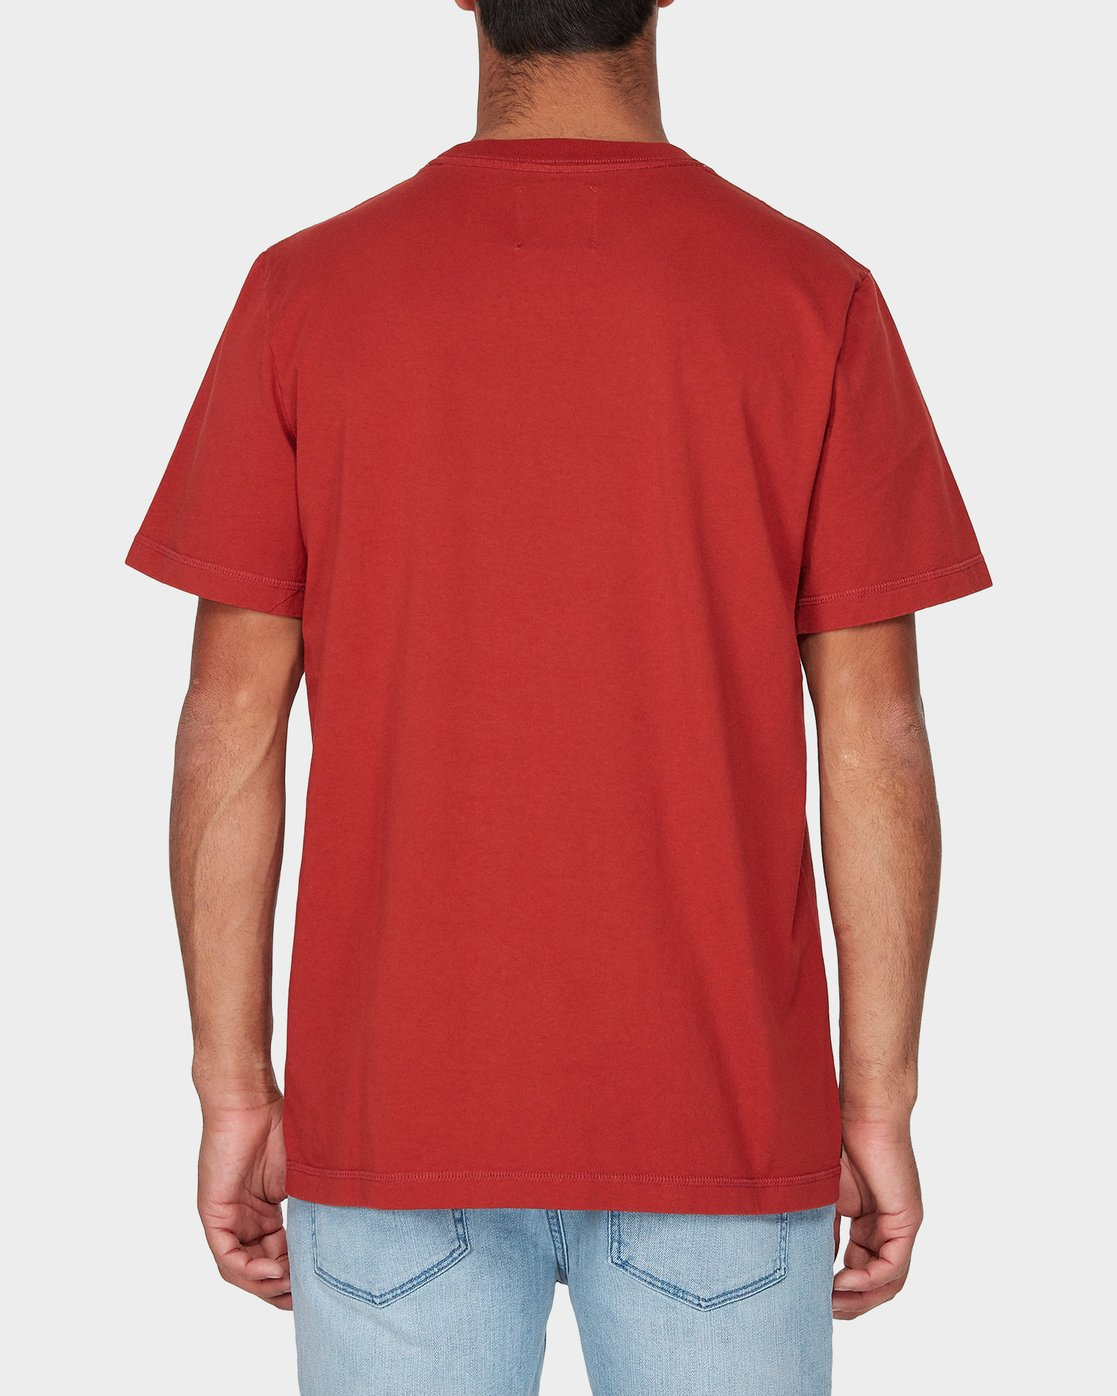 2 RVCA Crest Short Sleeve T-Shirt  R193055 RVCA